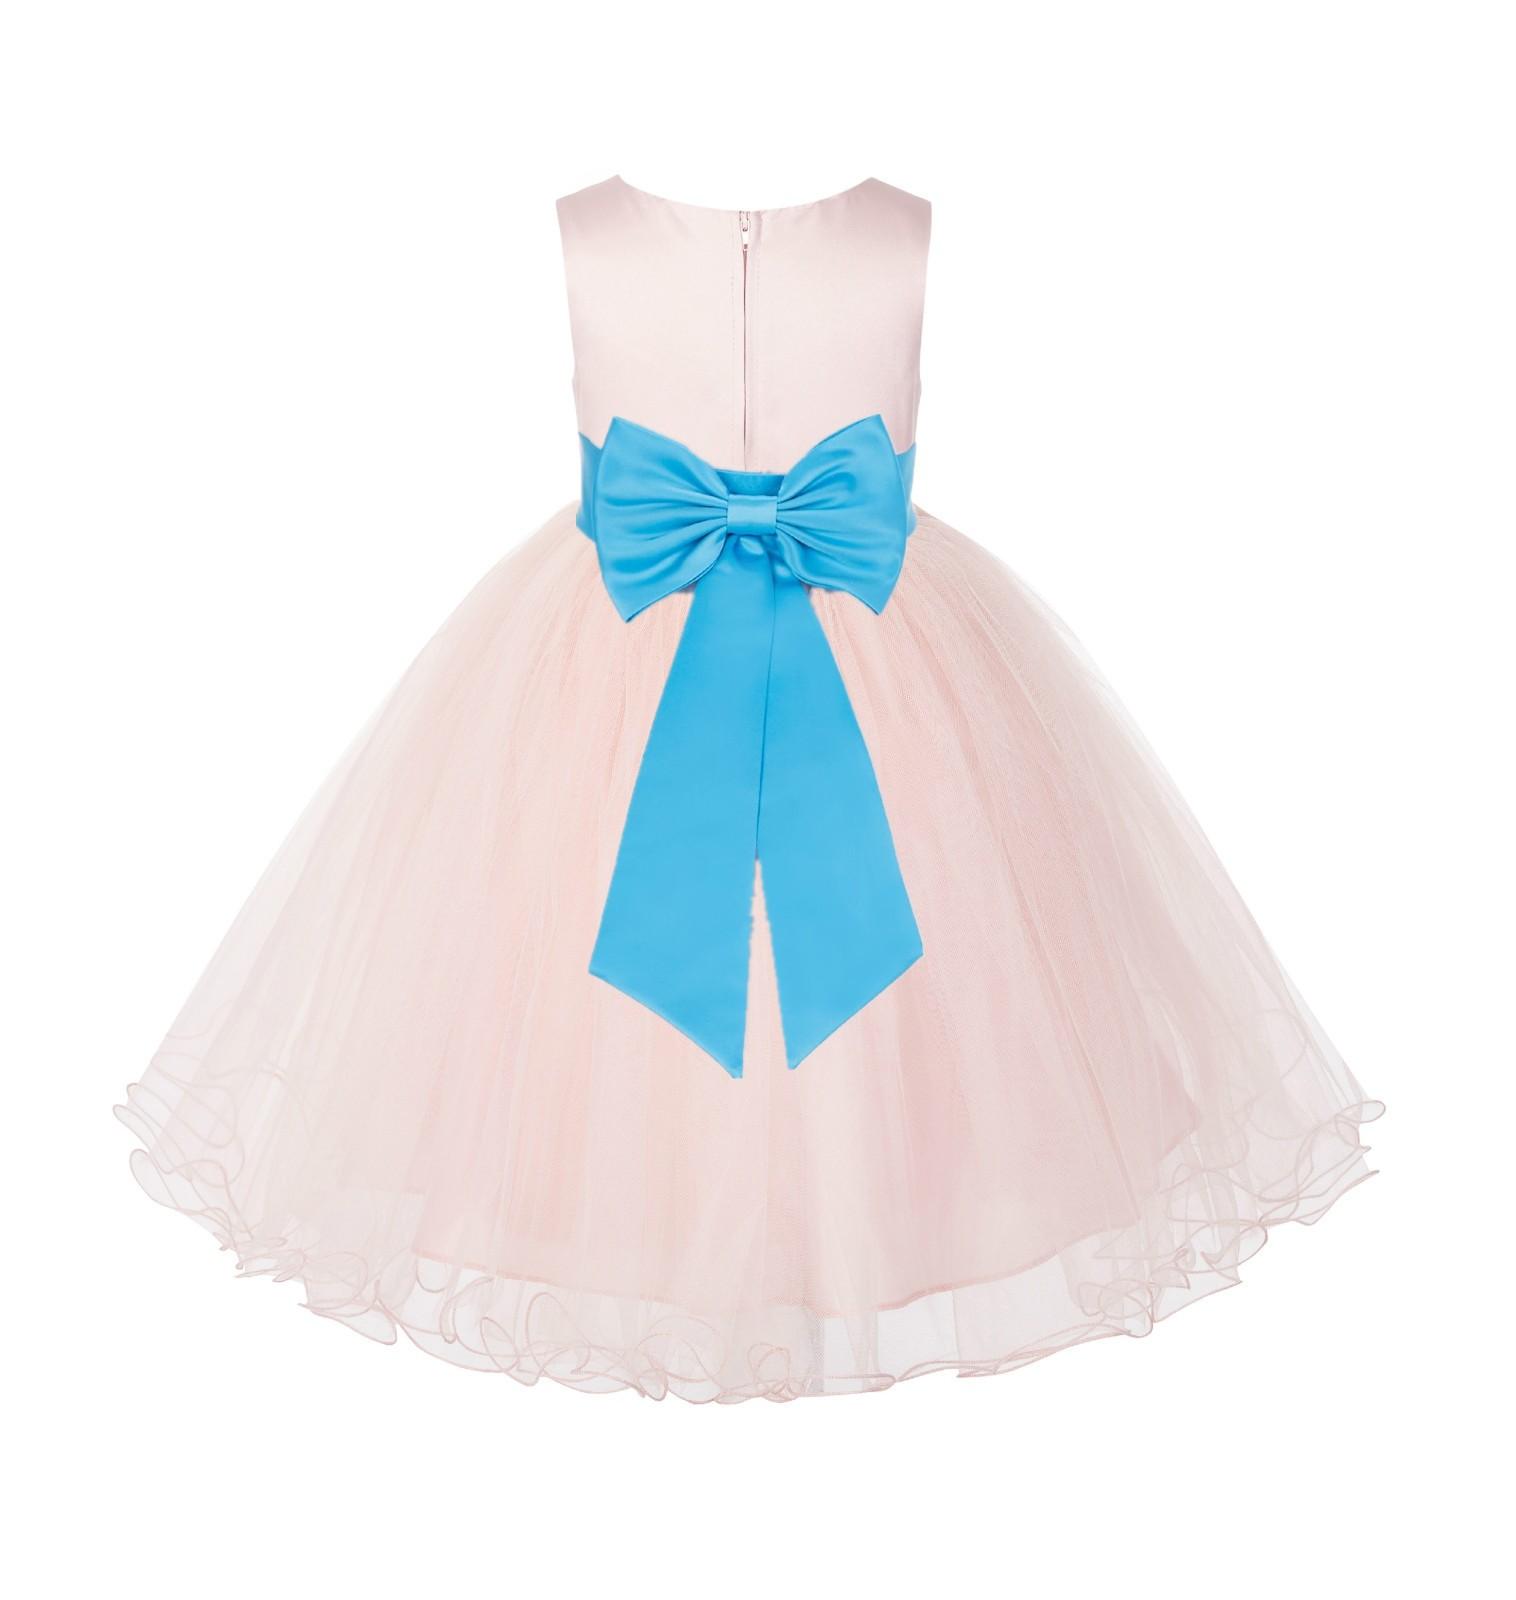 Blush PInk / Turquoise Tulle Rattail Edge Flower Girl Dress Wedding Bridesmaid 829T